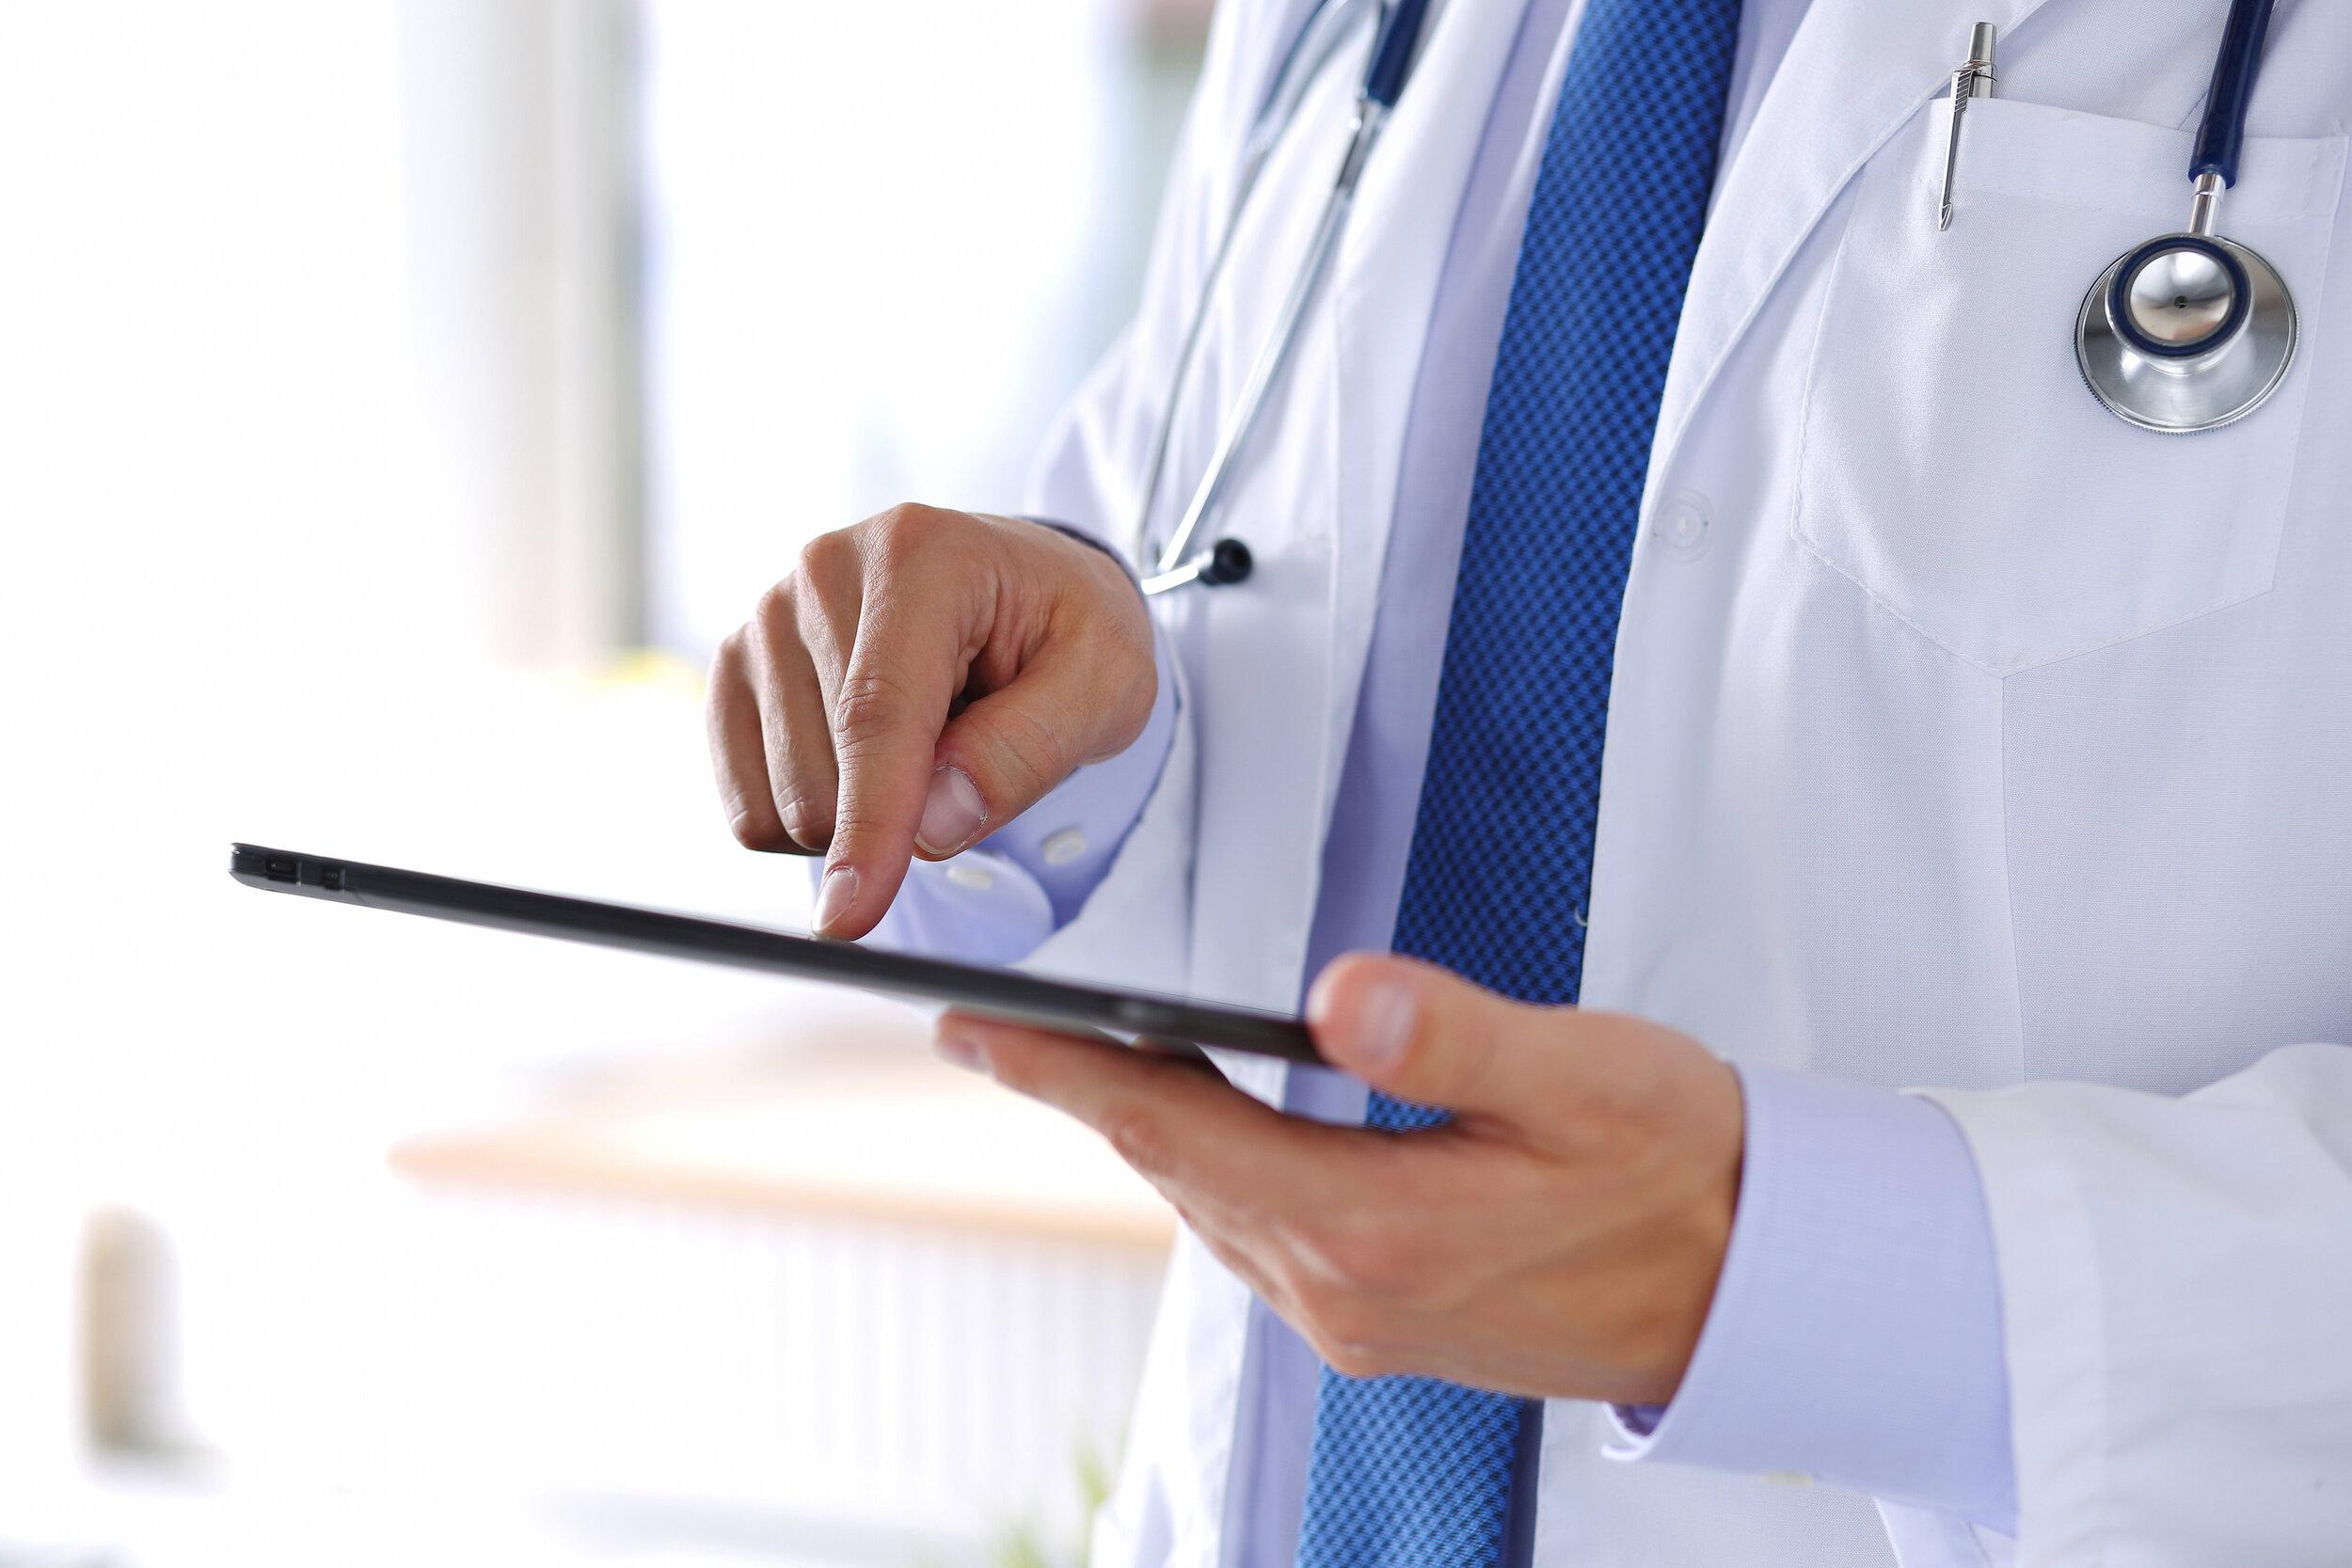 bigstock-Male-Medicine-Doctor-Holding-D-100250972.jpg